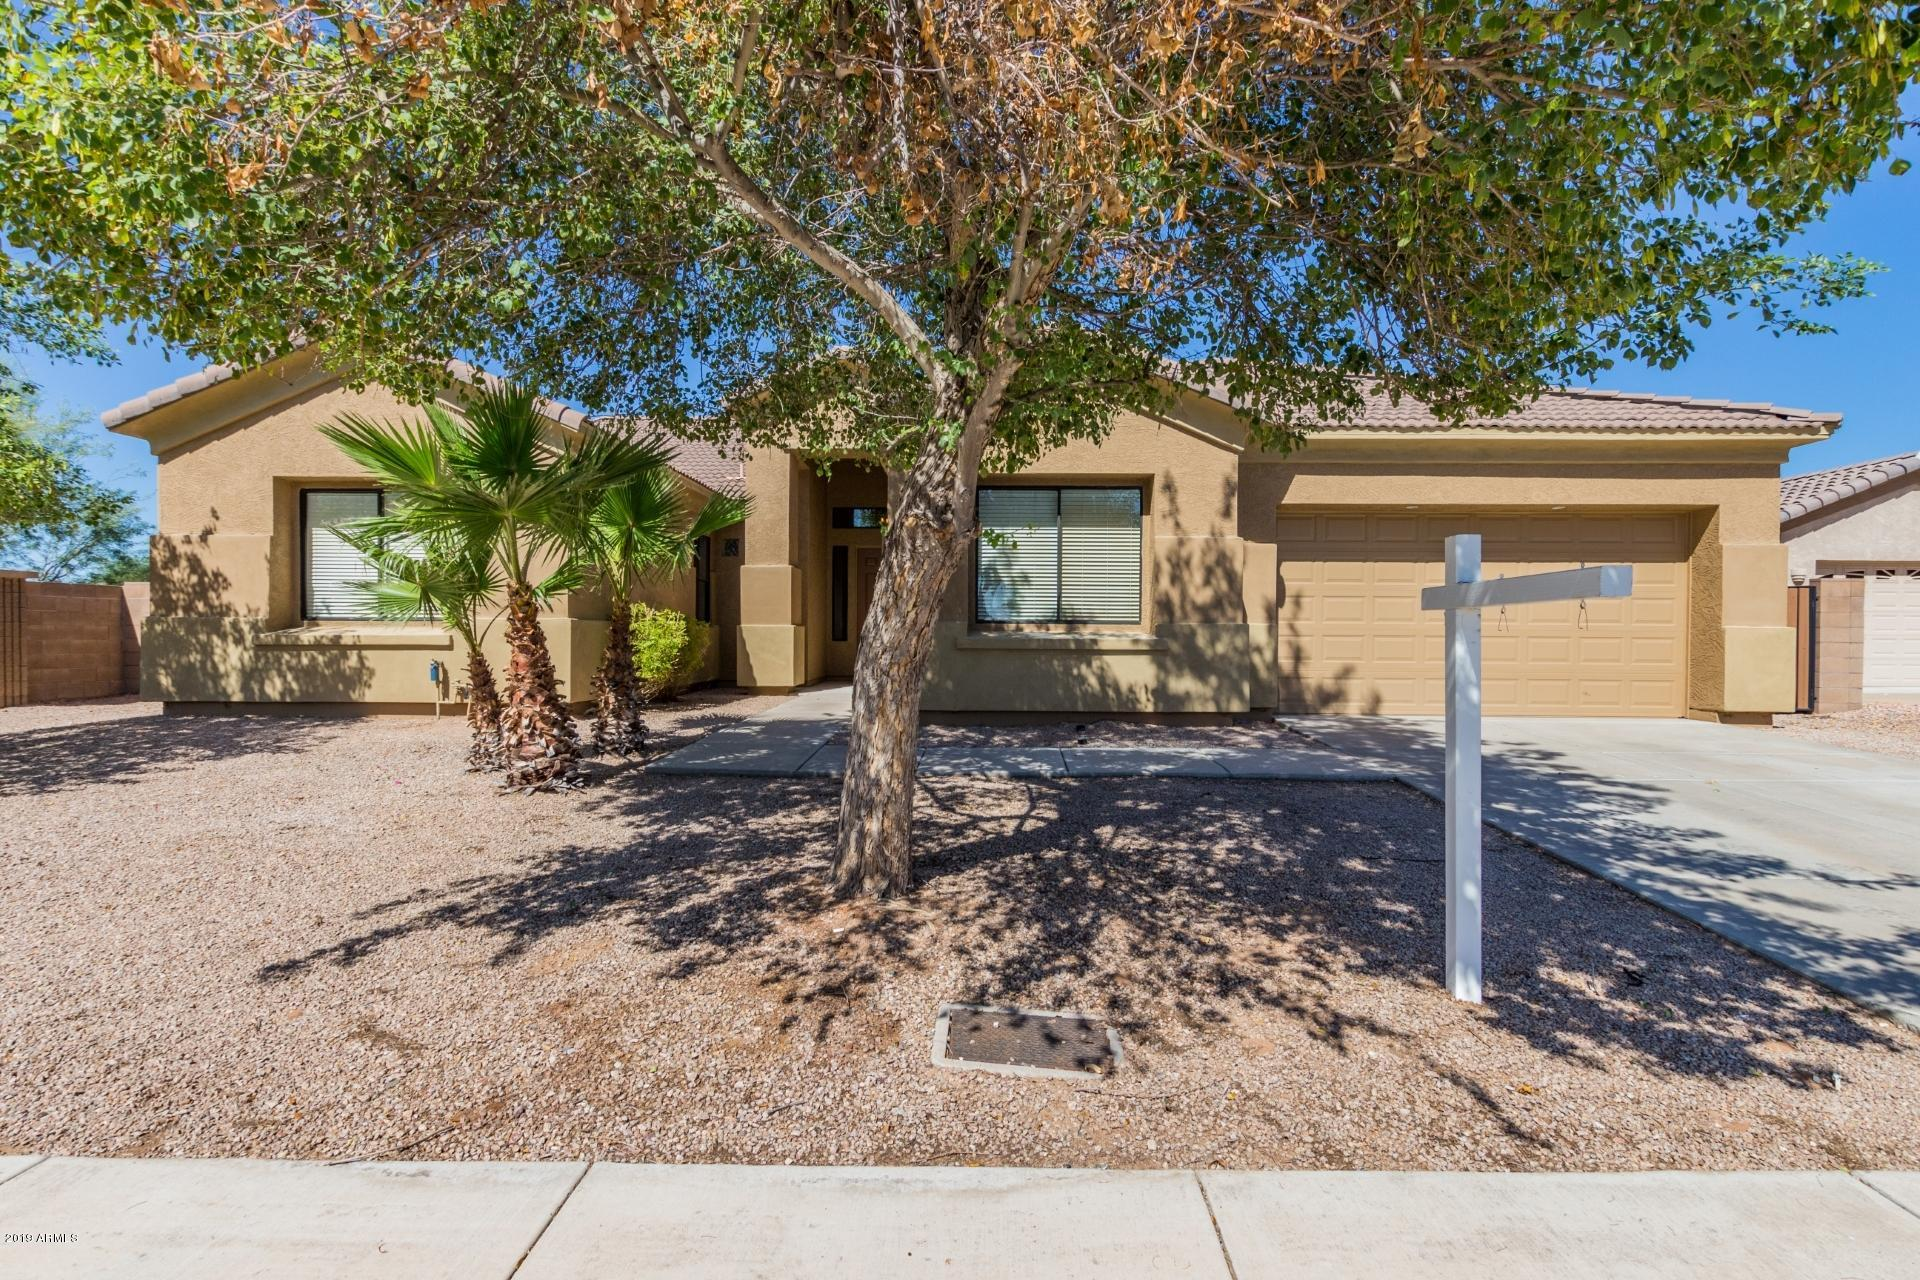 Photo of 11258 E ELLIS Street, Mesa, AZ 85207